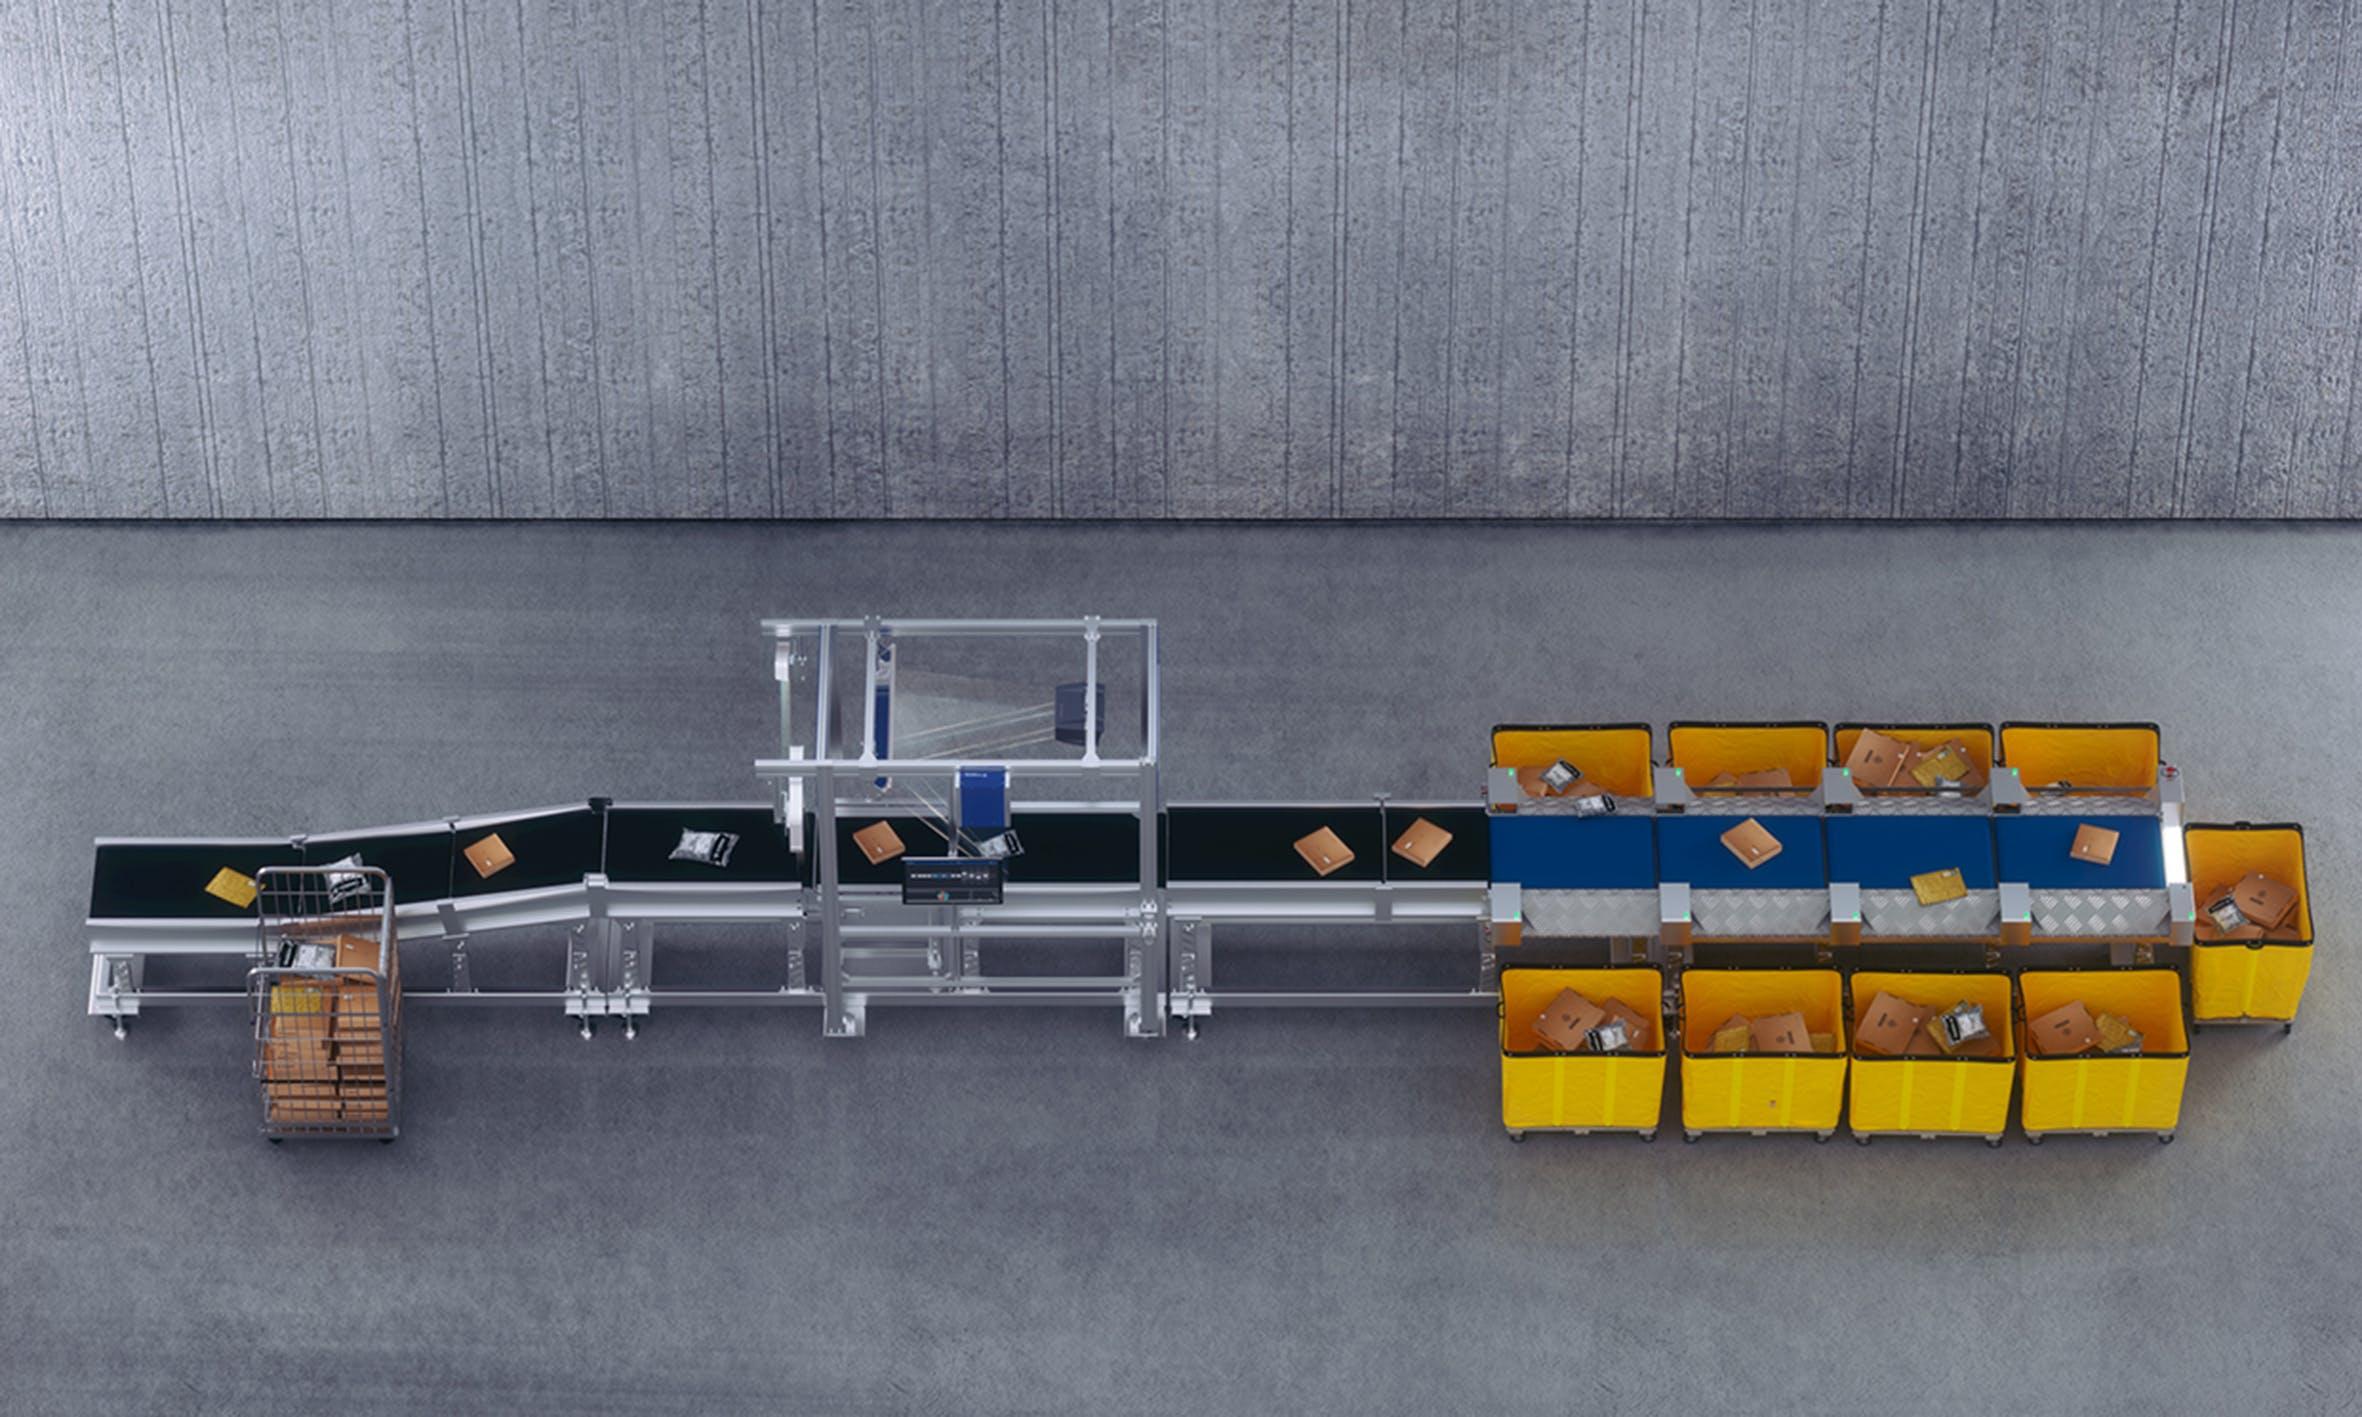 VITRONIC presents a complete solution for parcel logistics